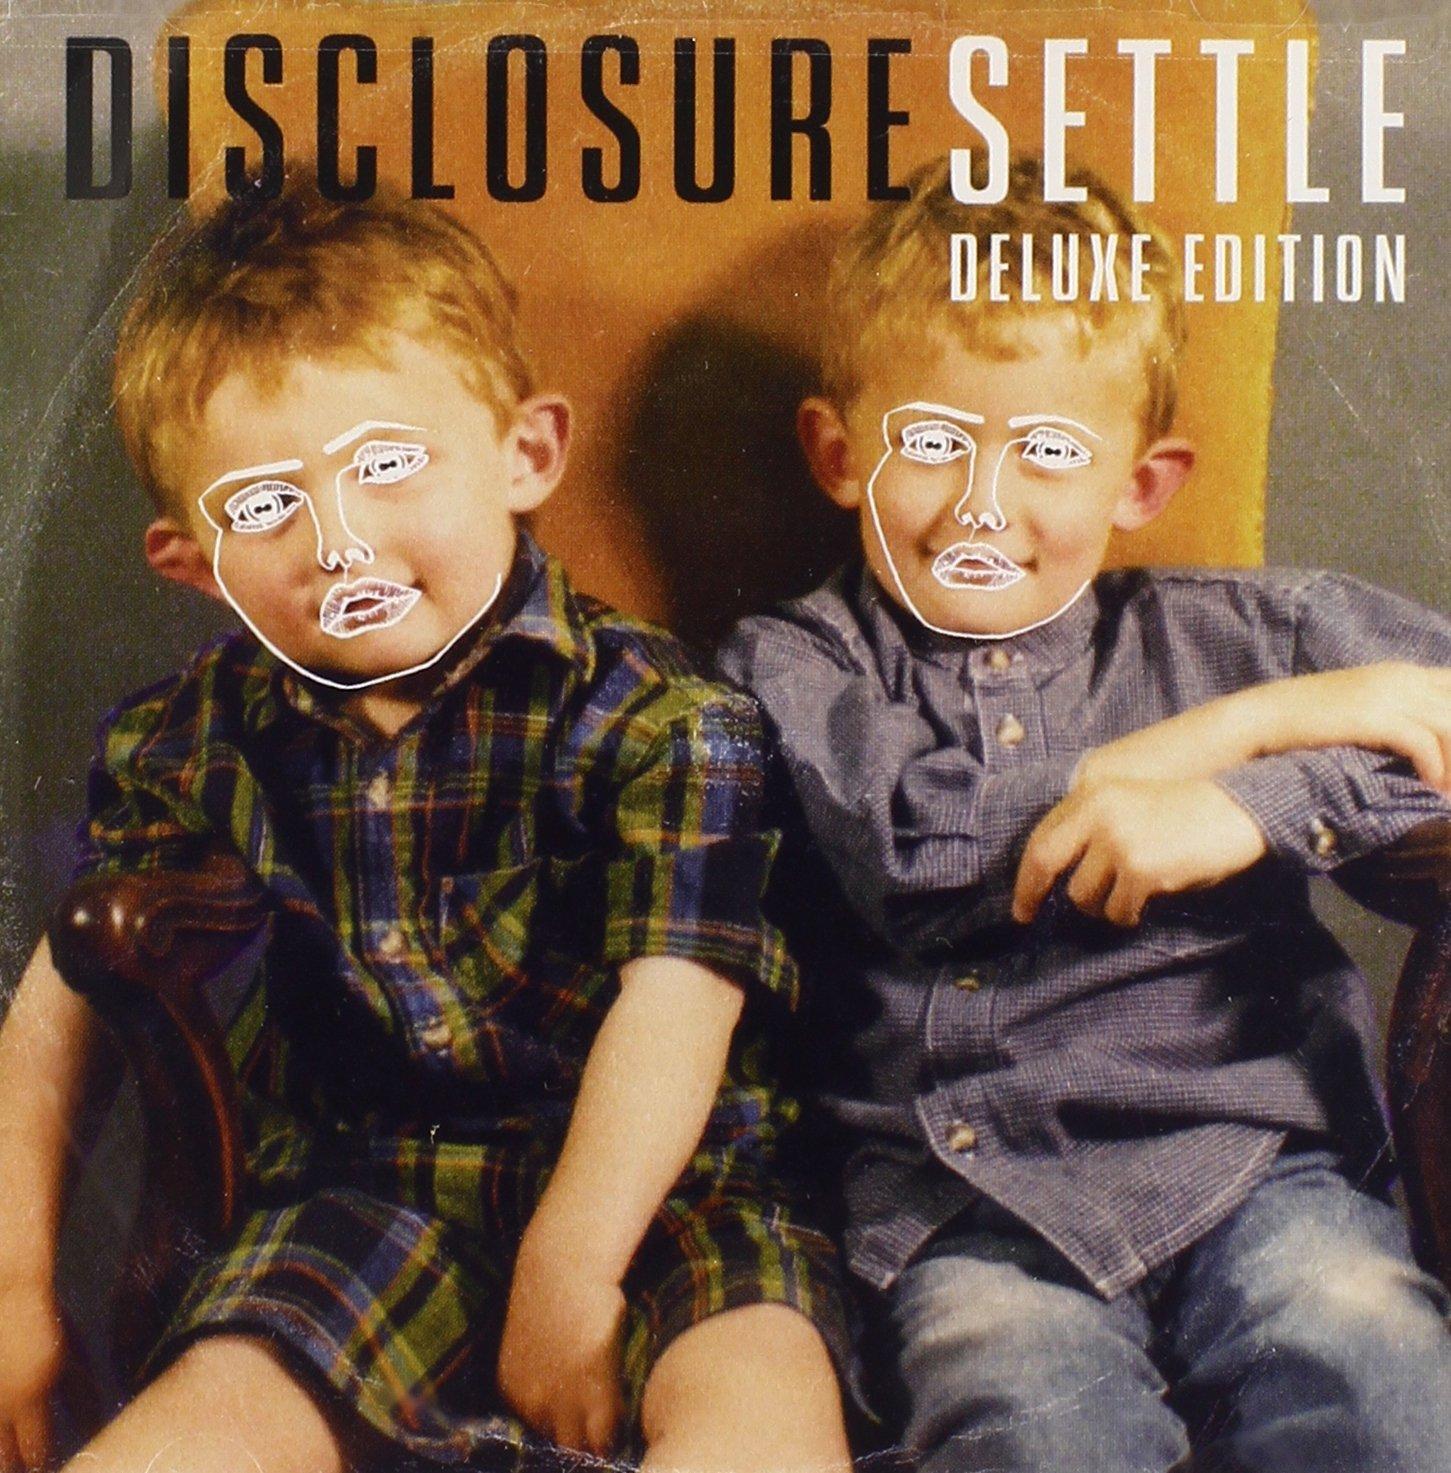 Disclosure - Settle [Deluxe Edition] - Amazon.com Music